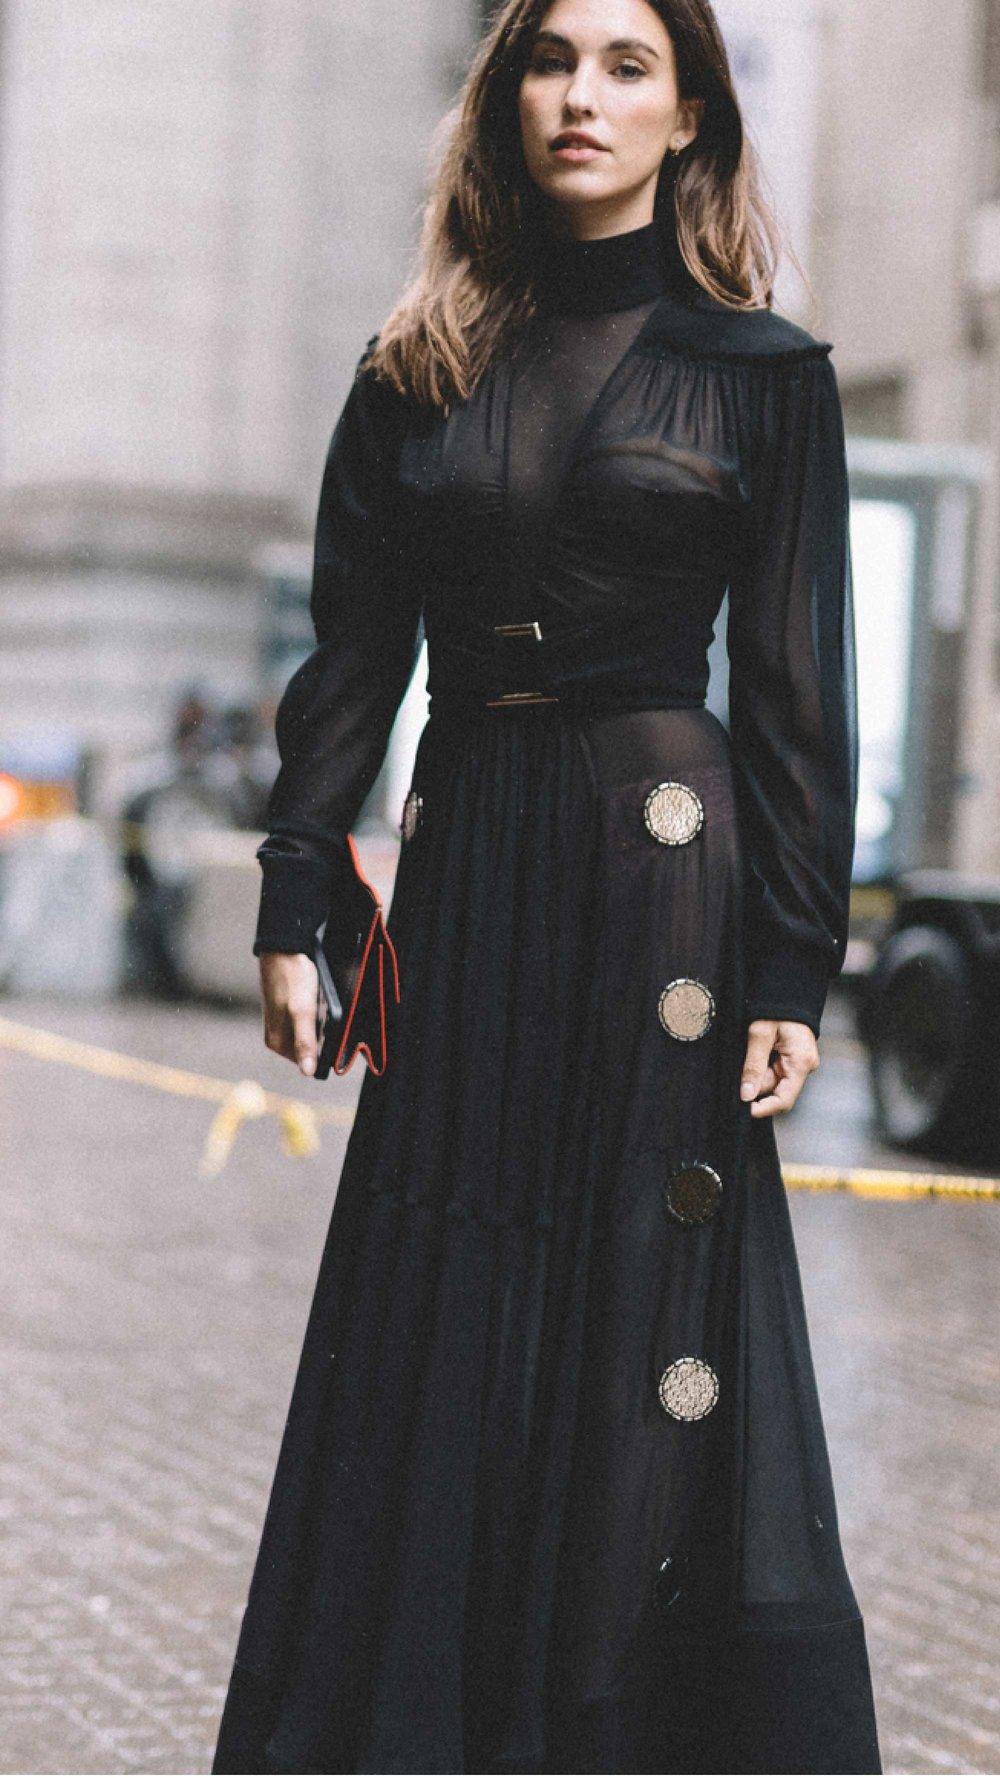 New-York-Fashion-Week-NYFW-SS18-street-style-day-five-SS18320.jpg